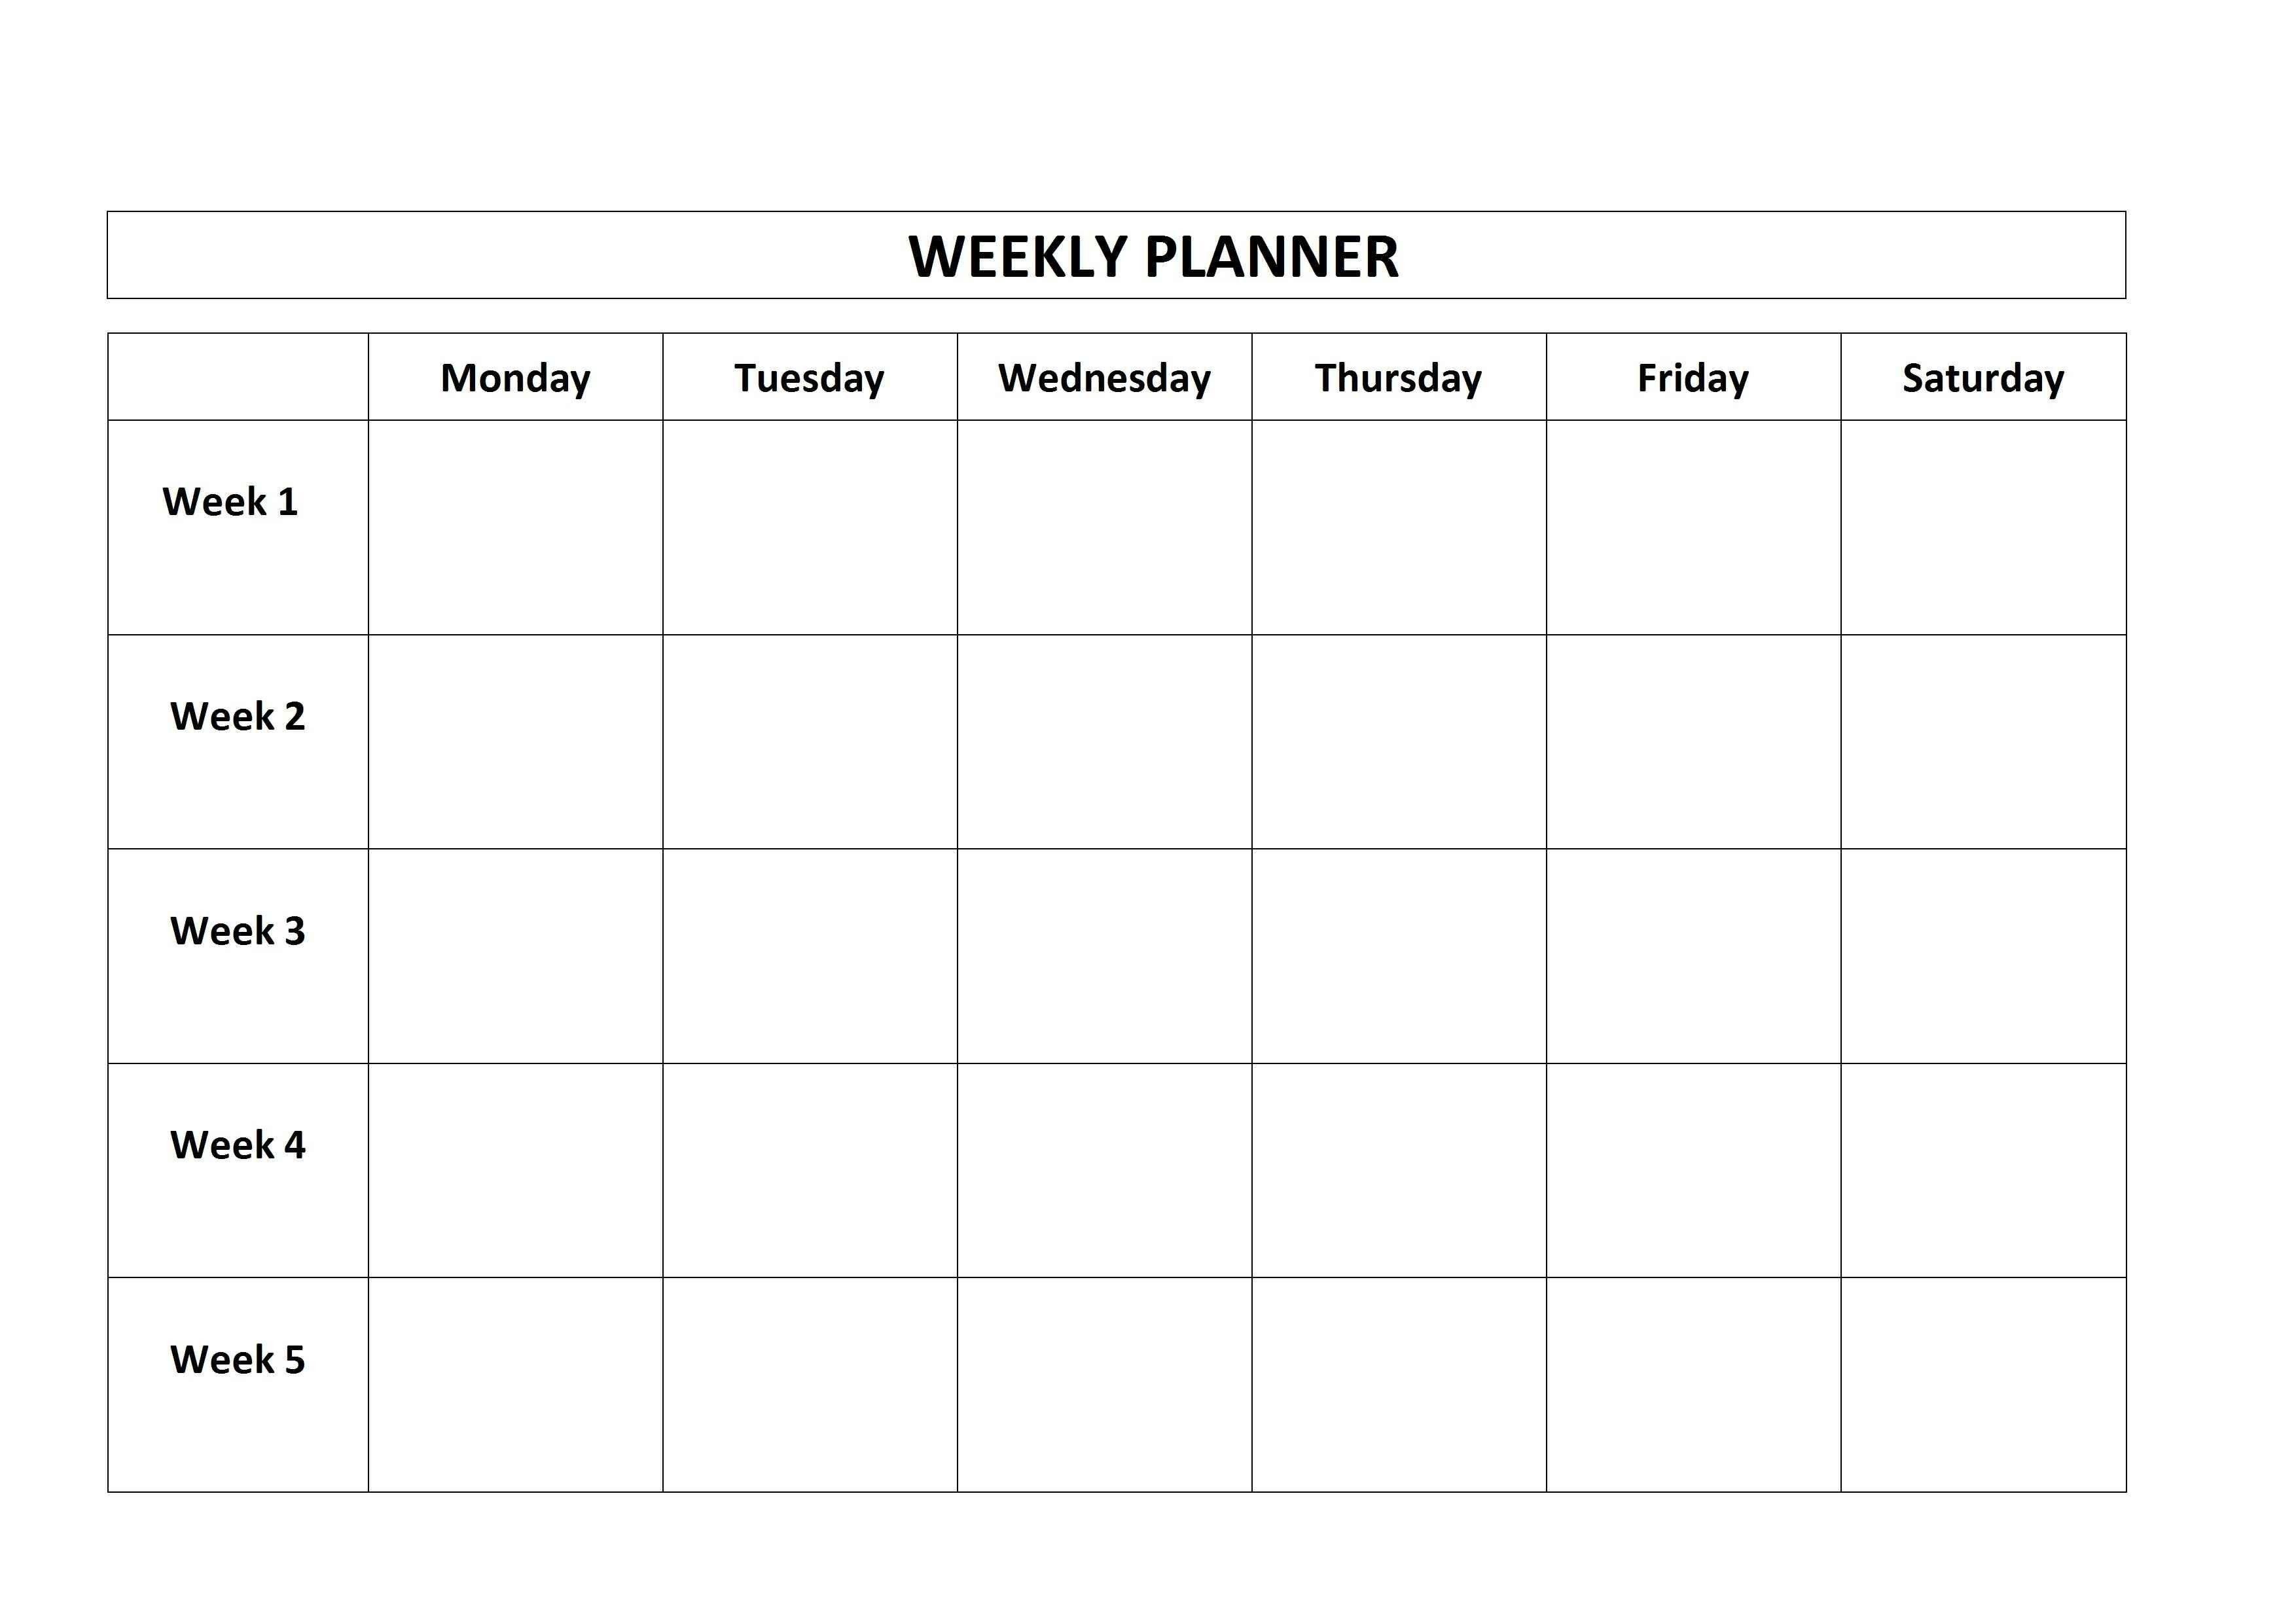 5 Day Calendar Template - Vaydile.euforic.co-Blank Calendar-5 Day Template Calendar Blank